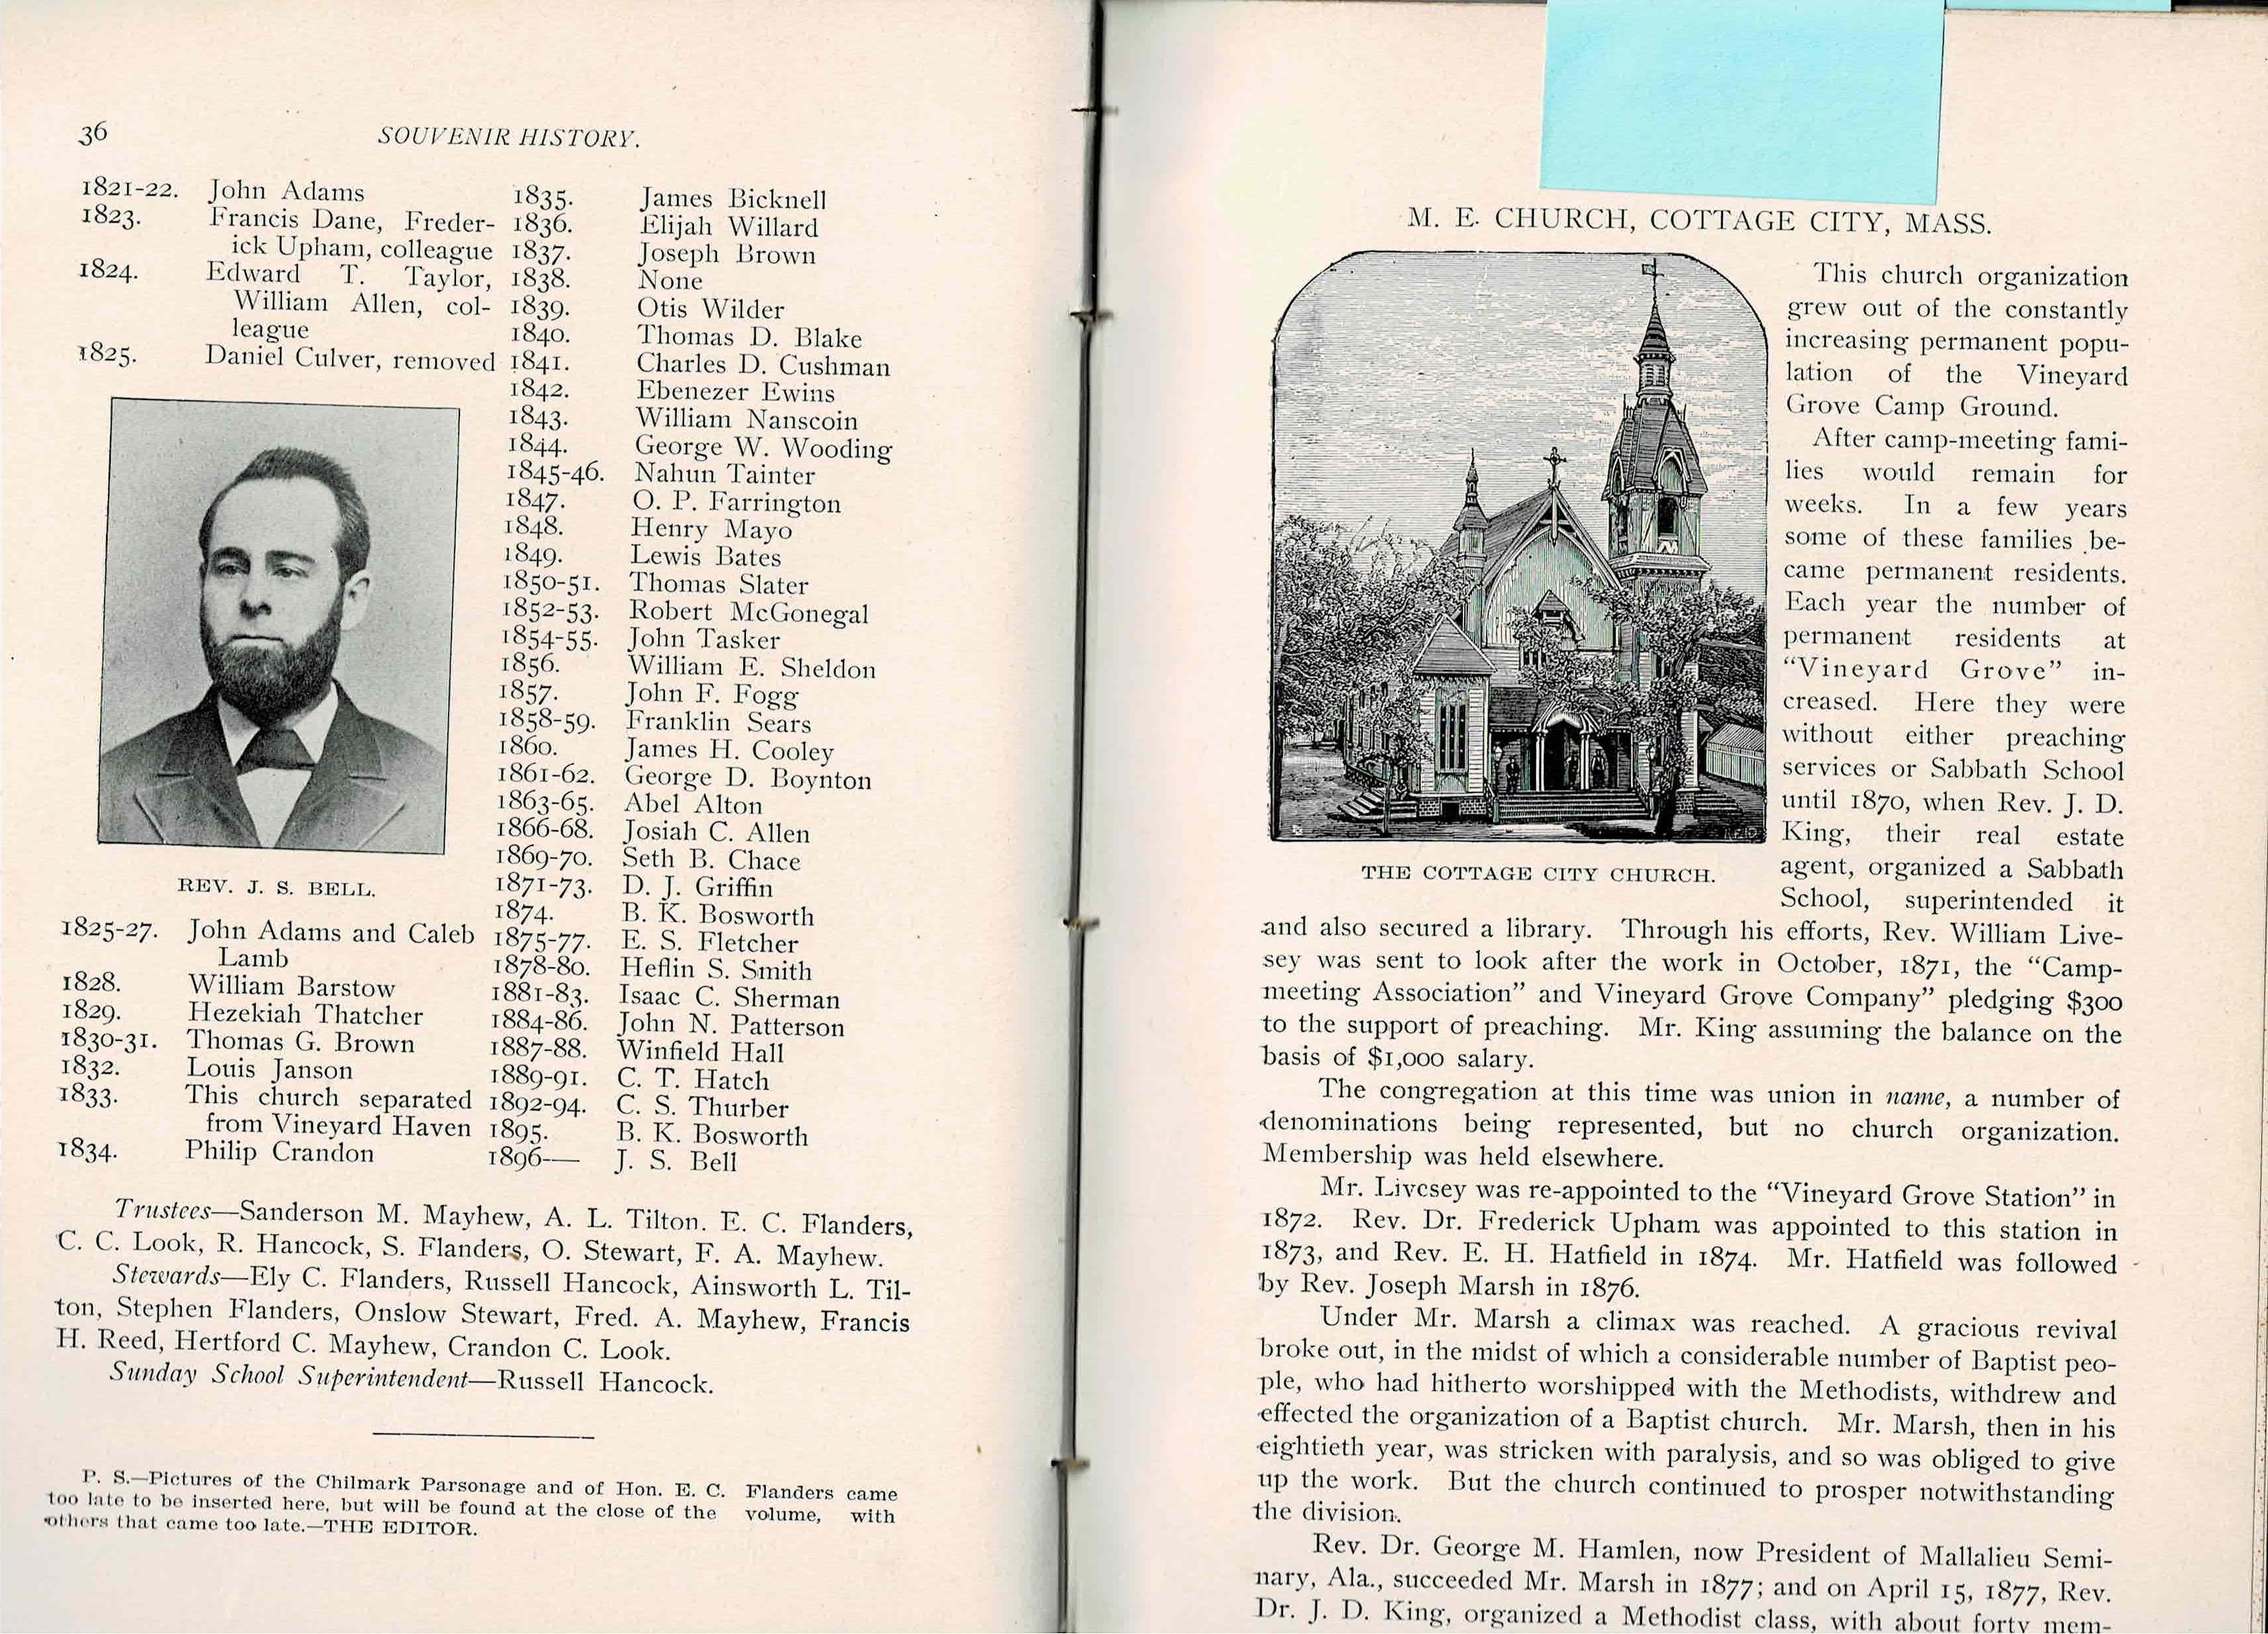 Souvenir history page 2